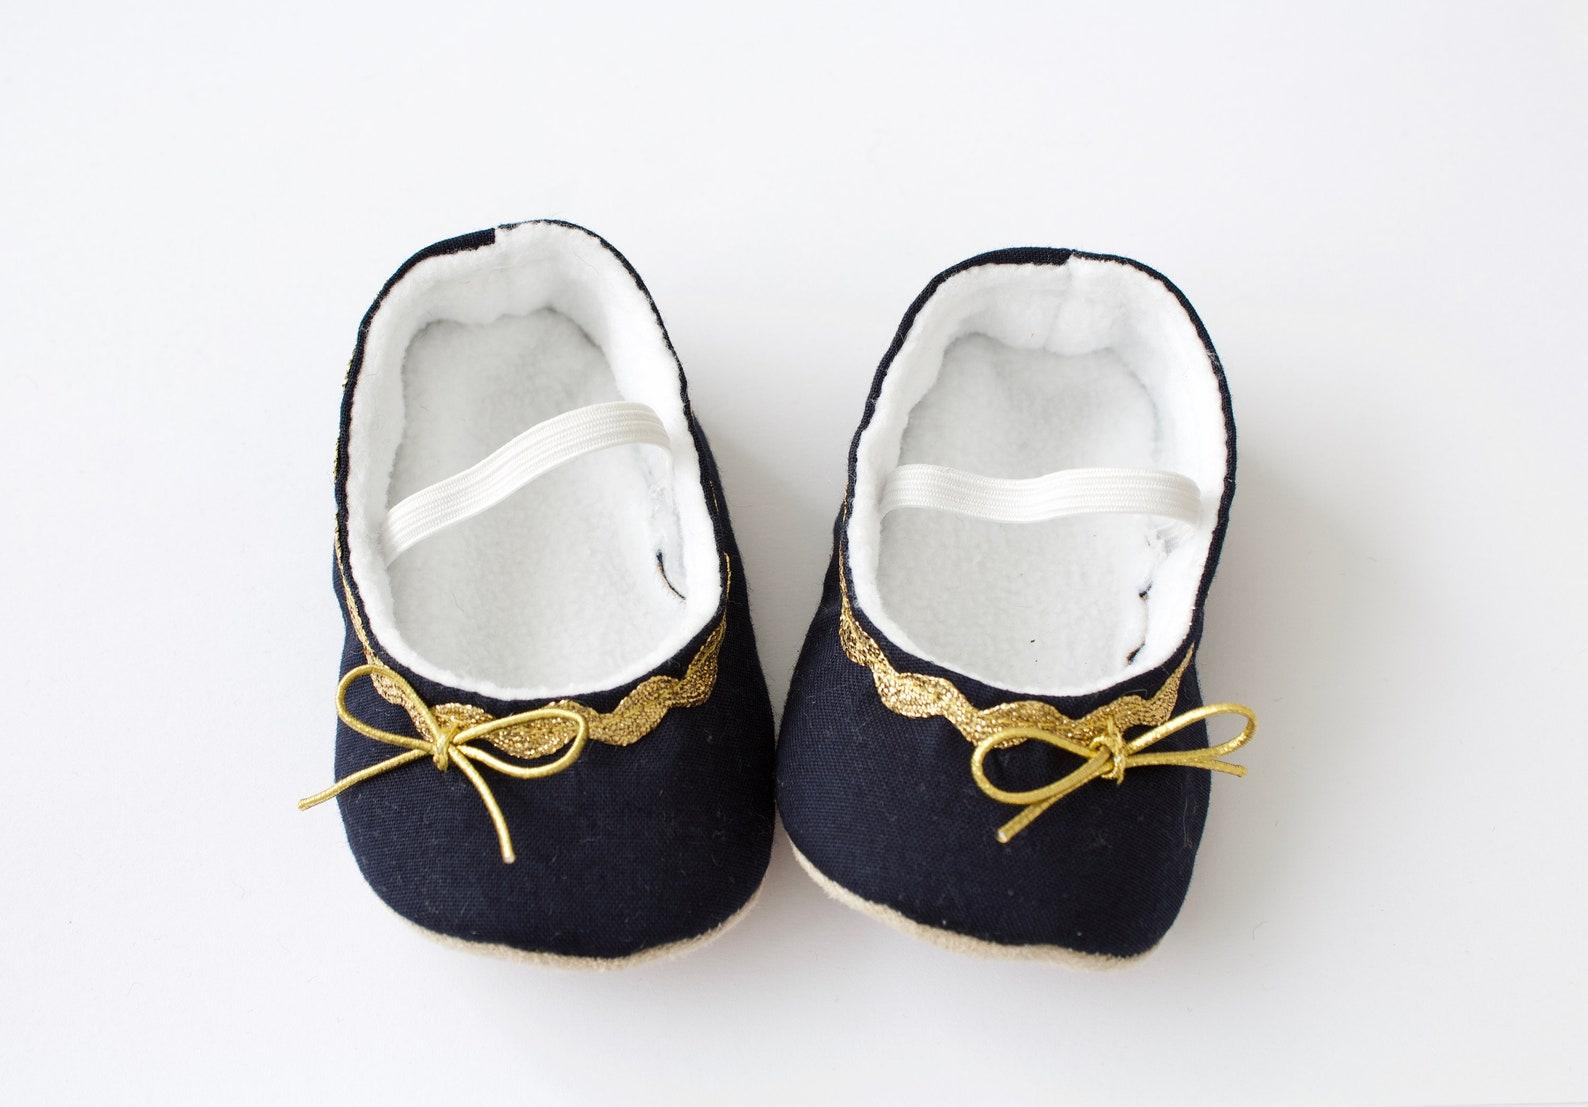 baby girl shoe, baby shoe ballet flat, navy baby girl shoe, girls shoe, baby ballet flats navy with gold trim